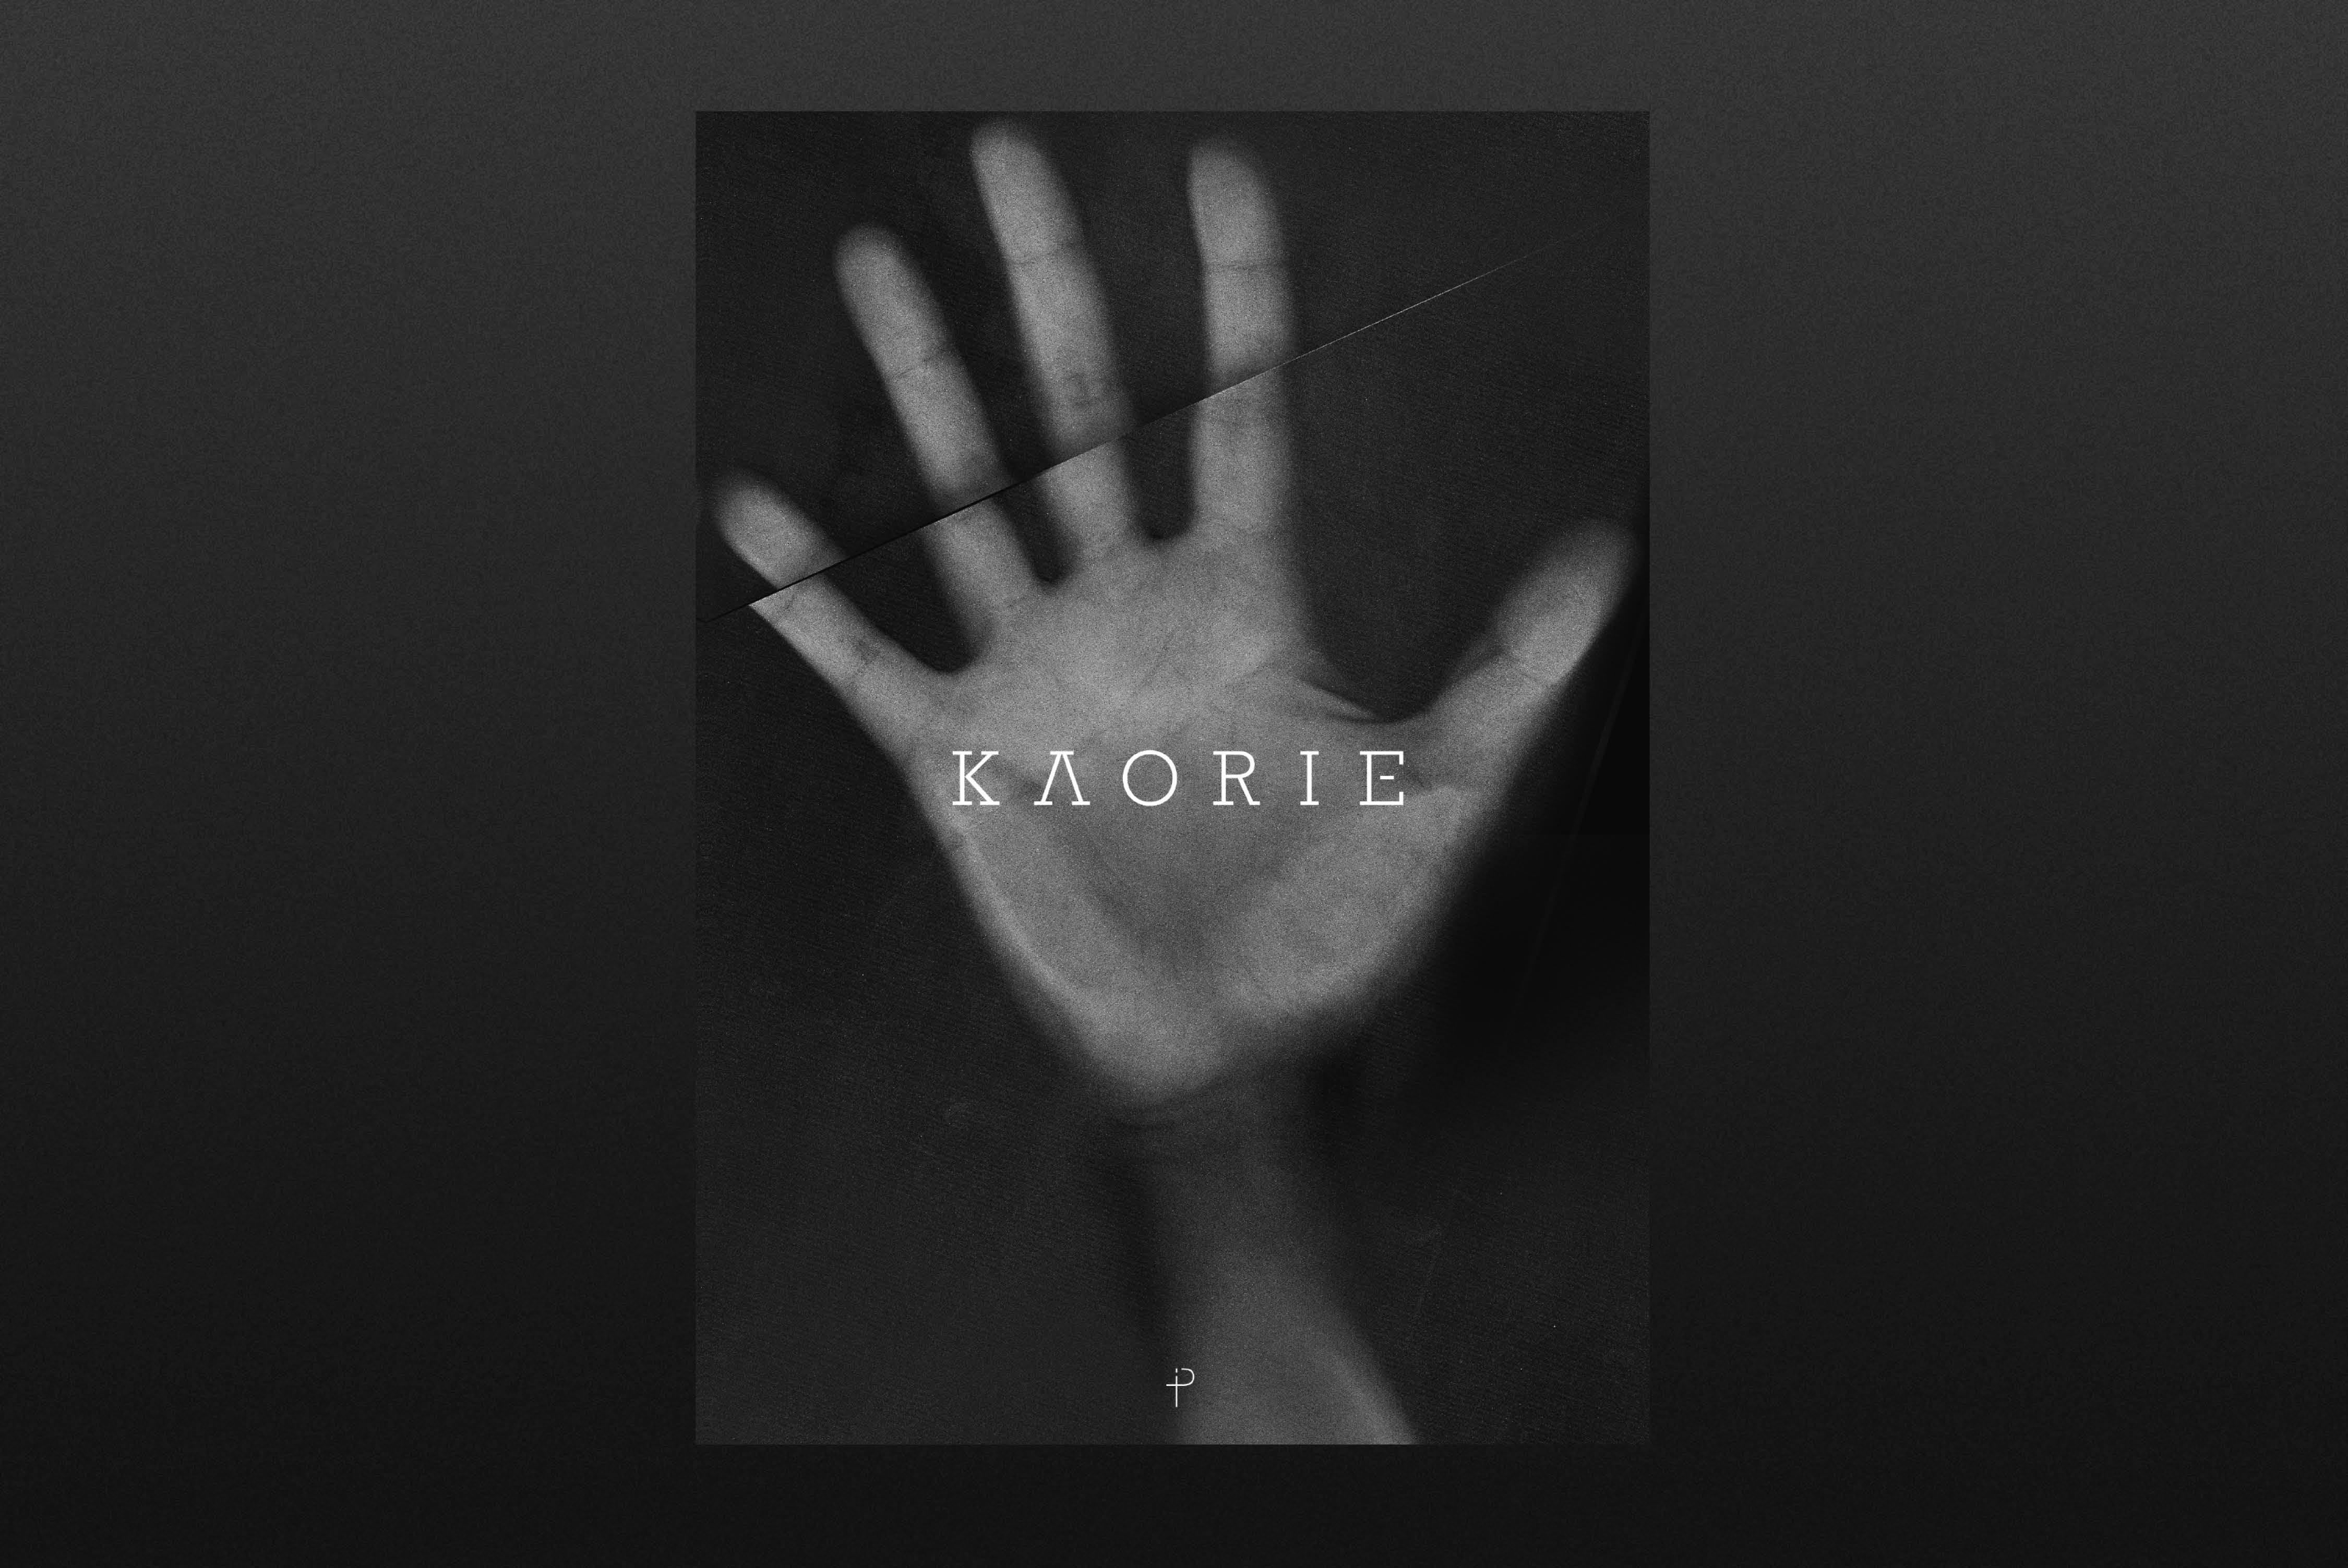 Kaorie